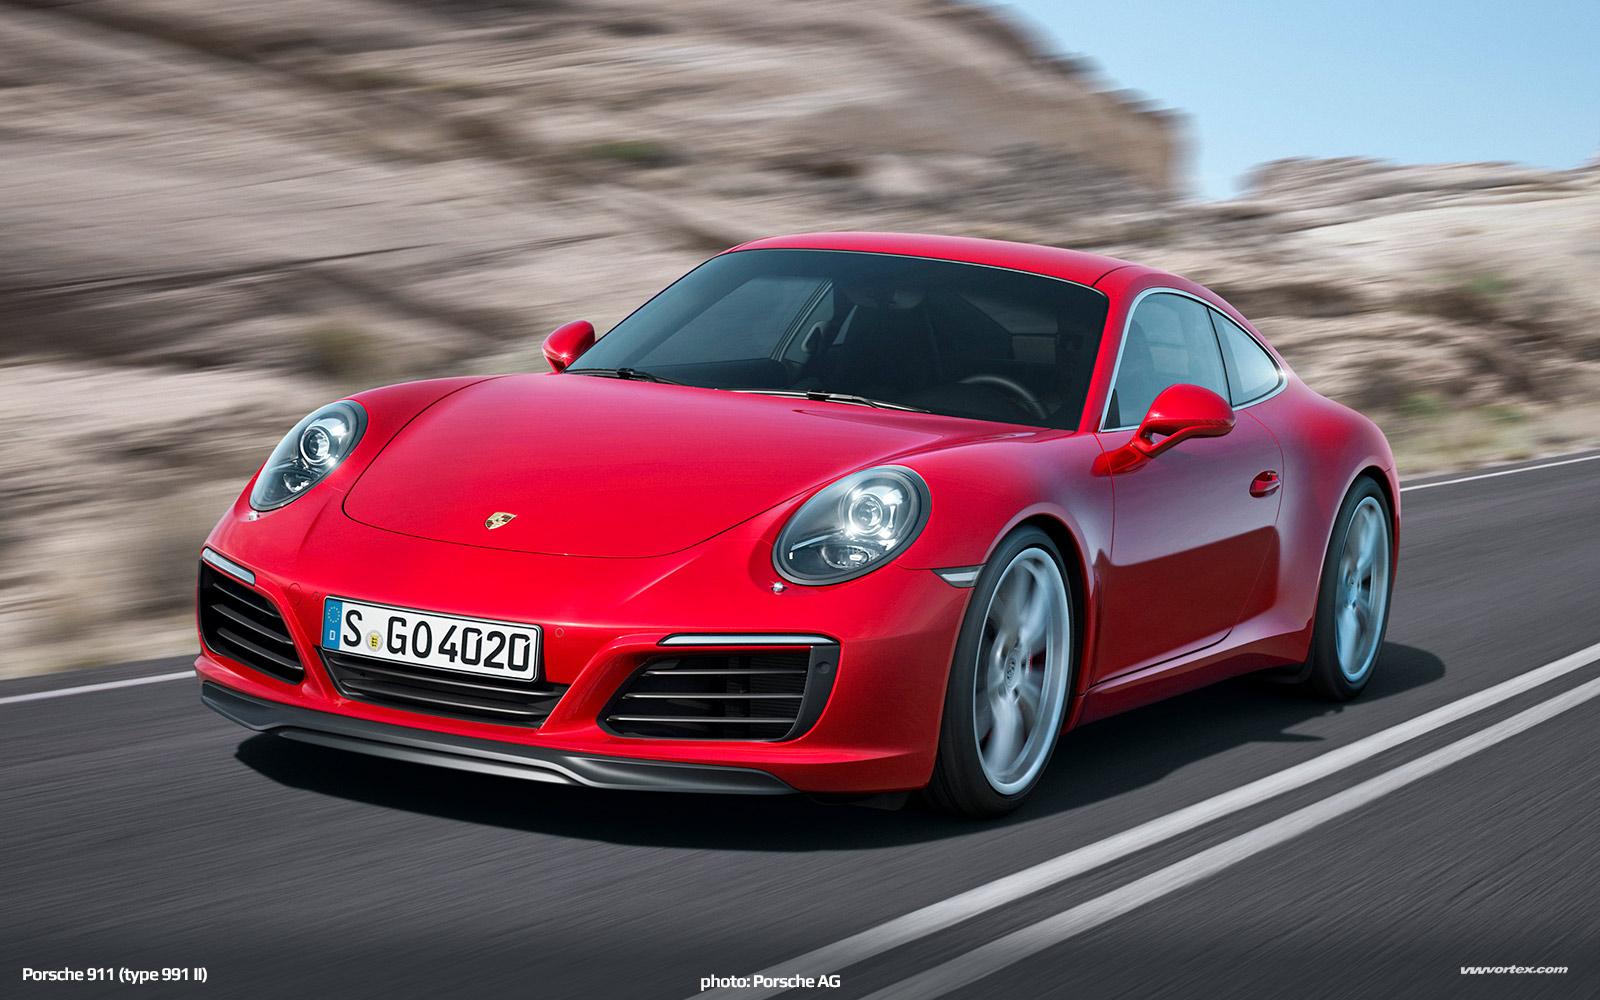 Porsche-911-991-ii-2016-508